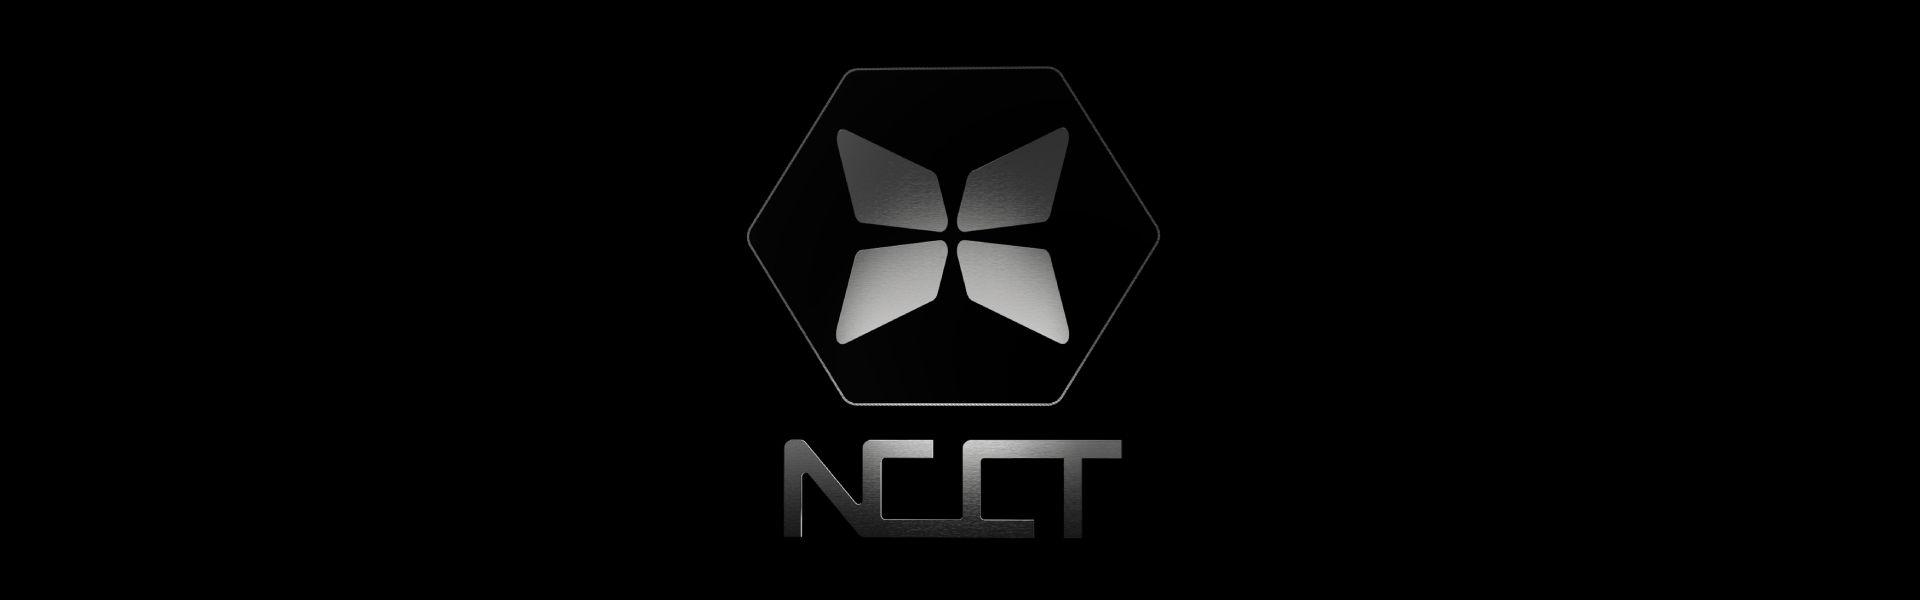 ncct-header.jpg